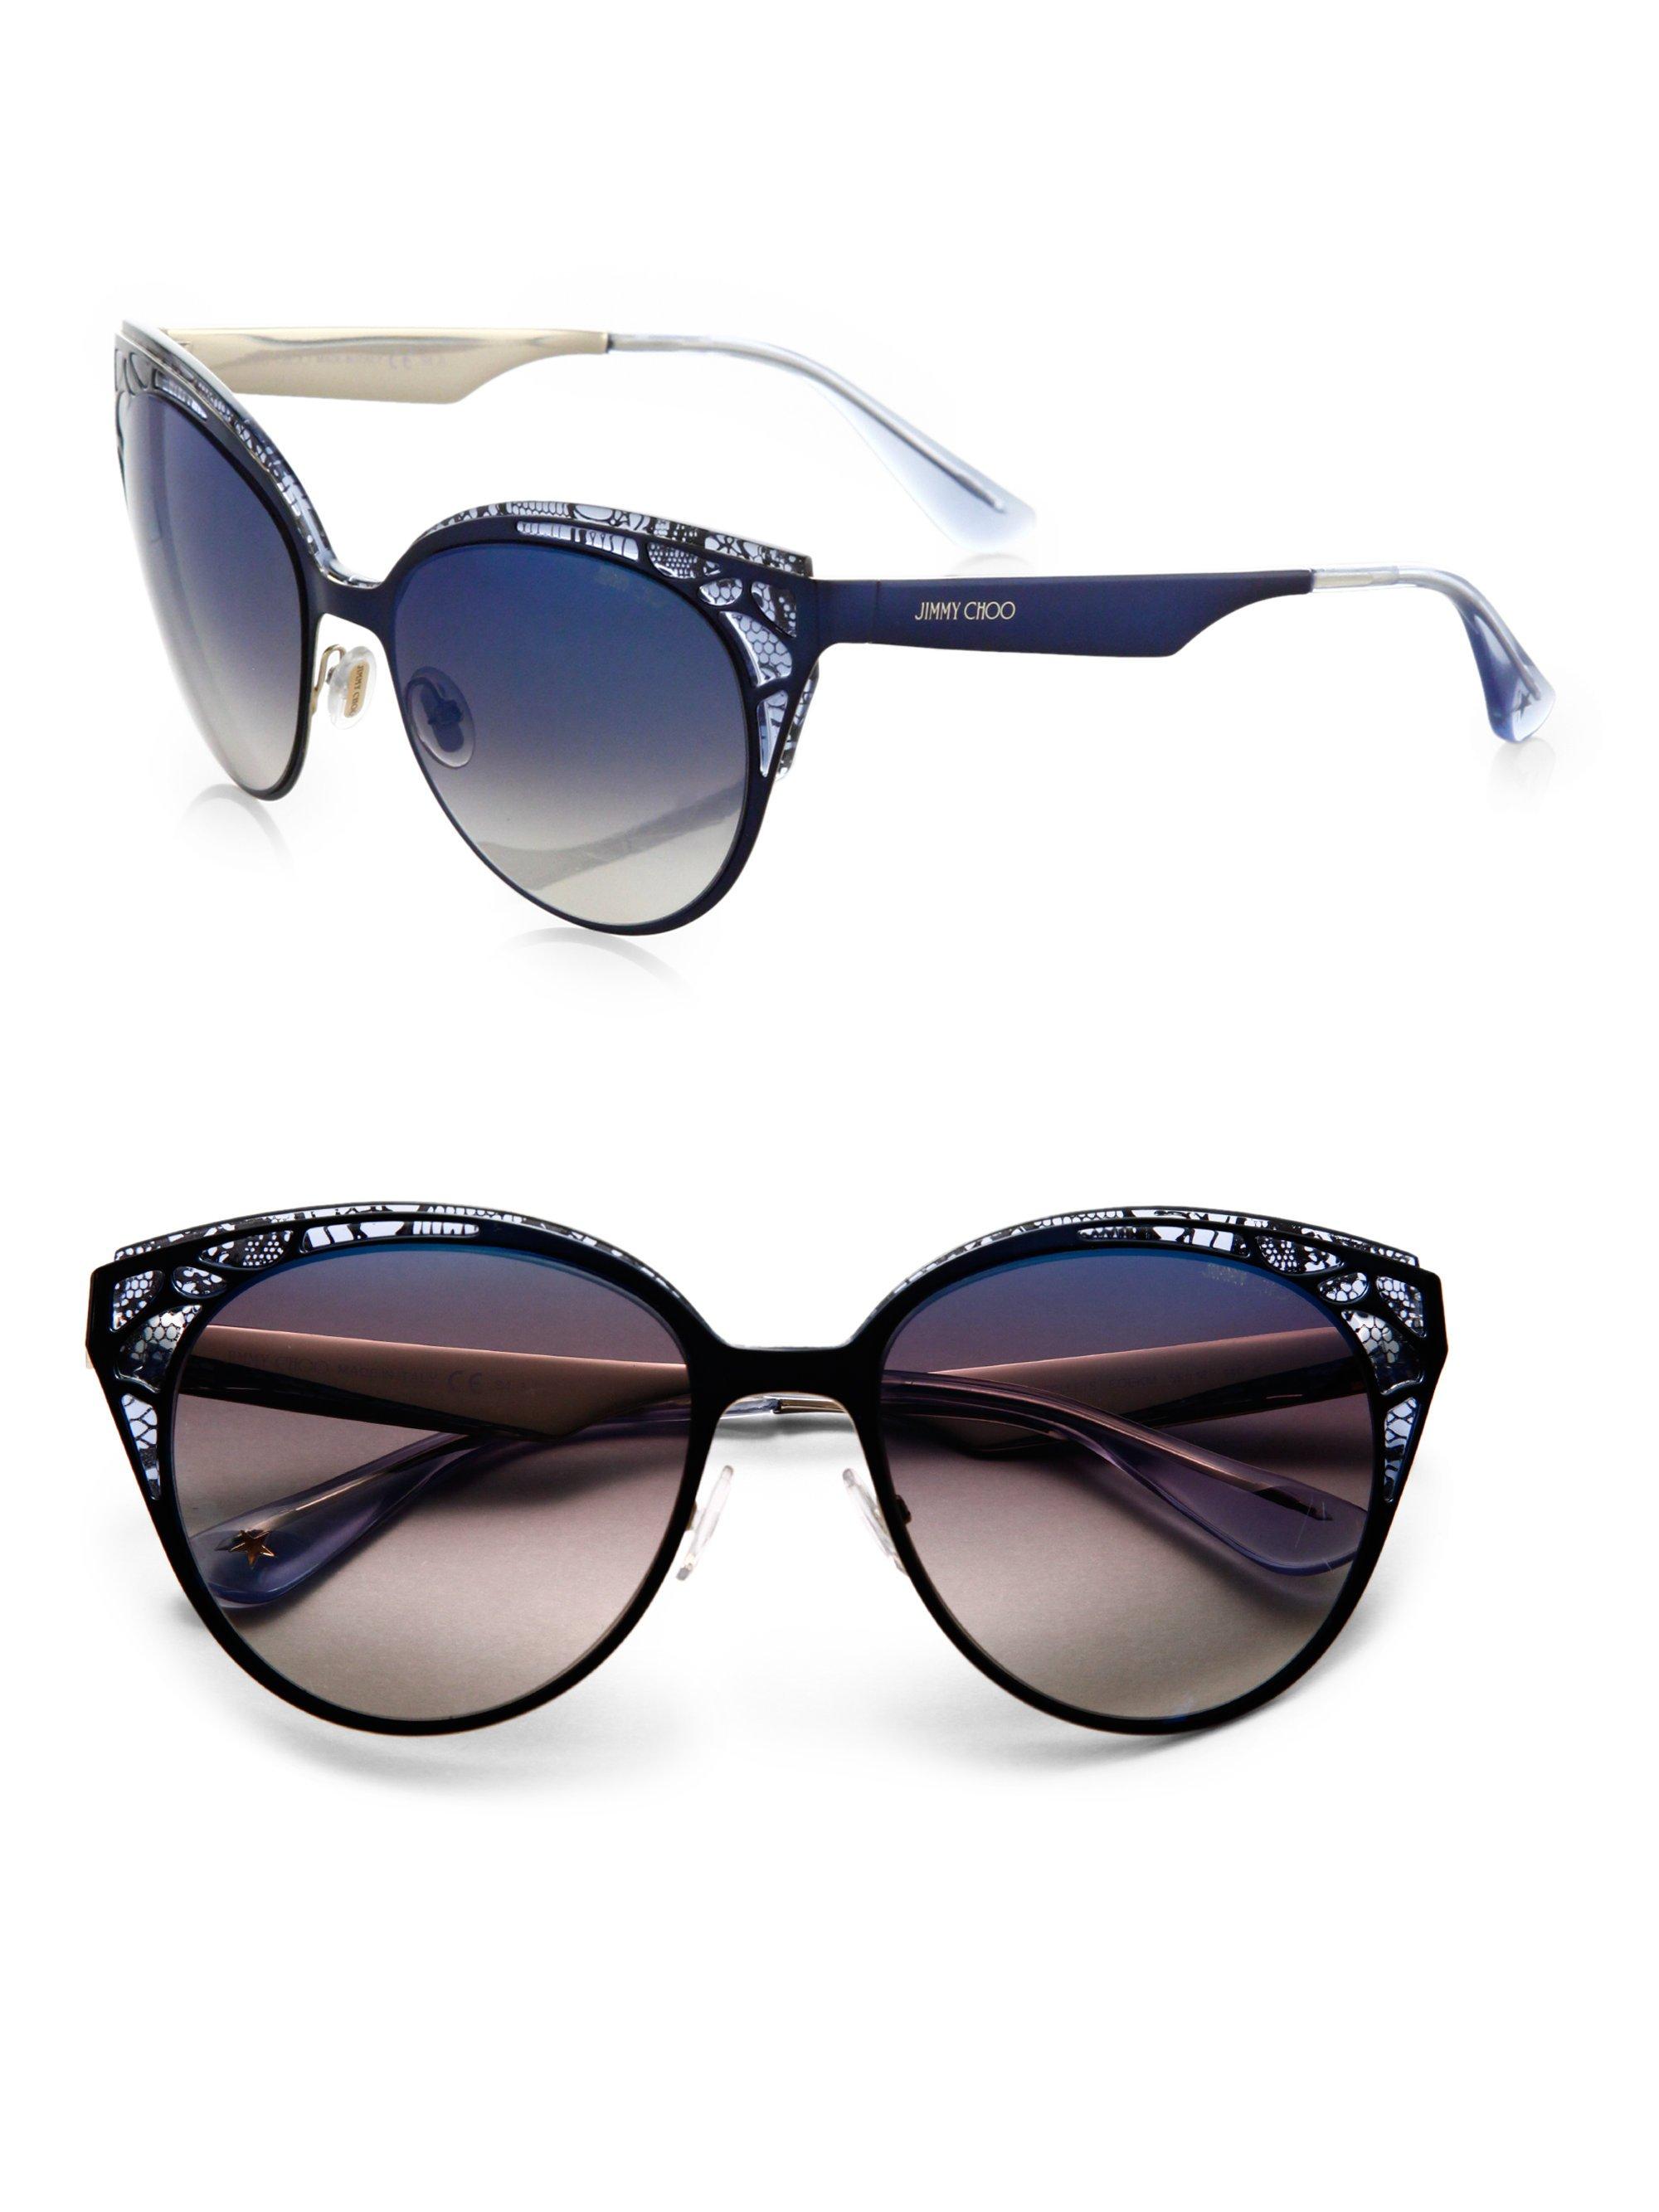 Jimmy Choo Estelle Sunglasses